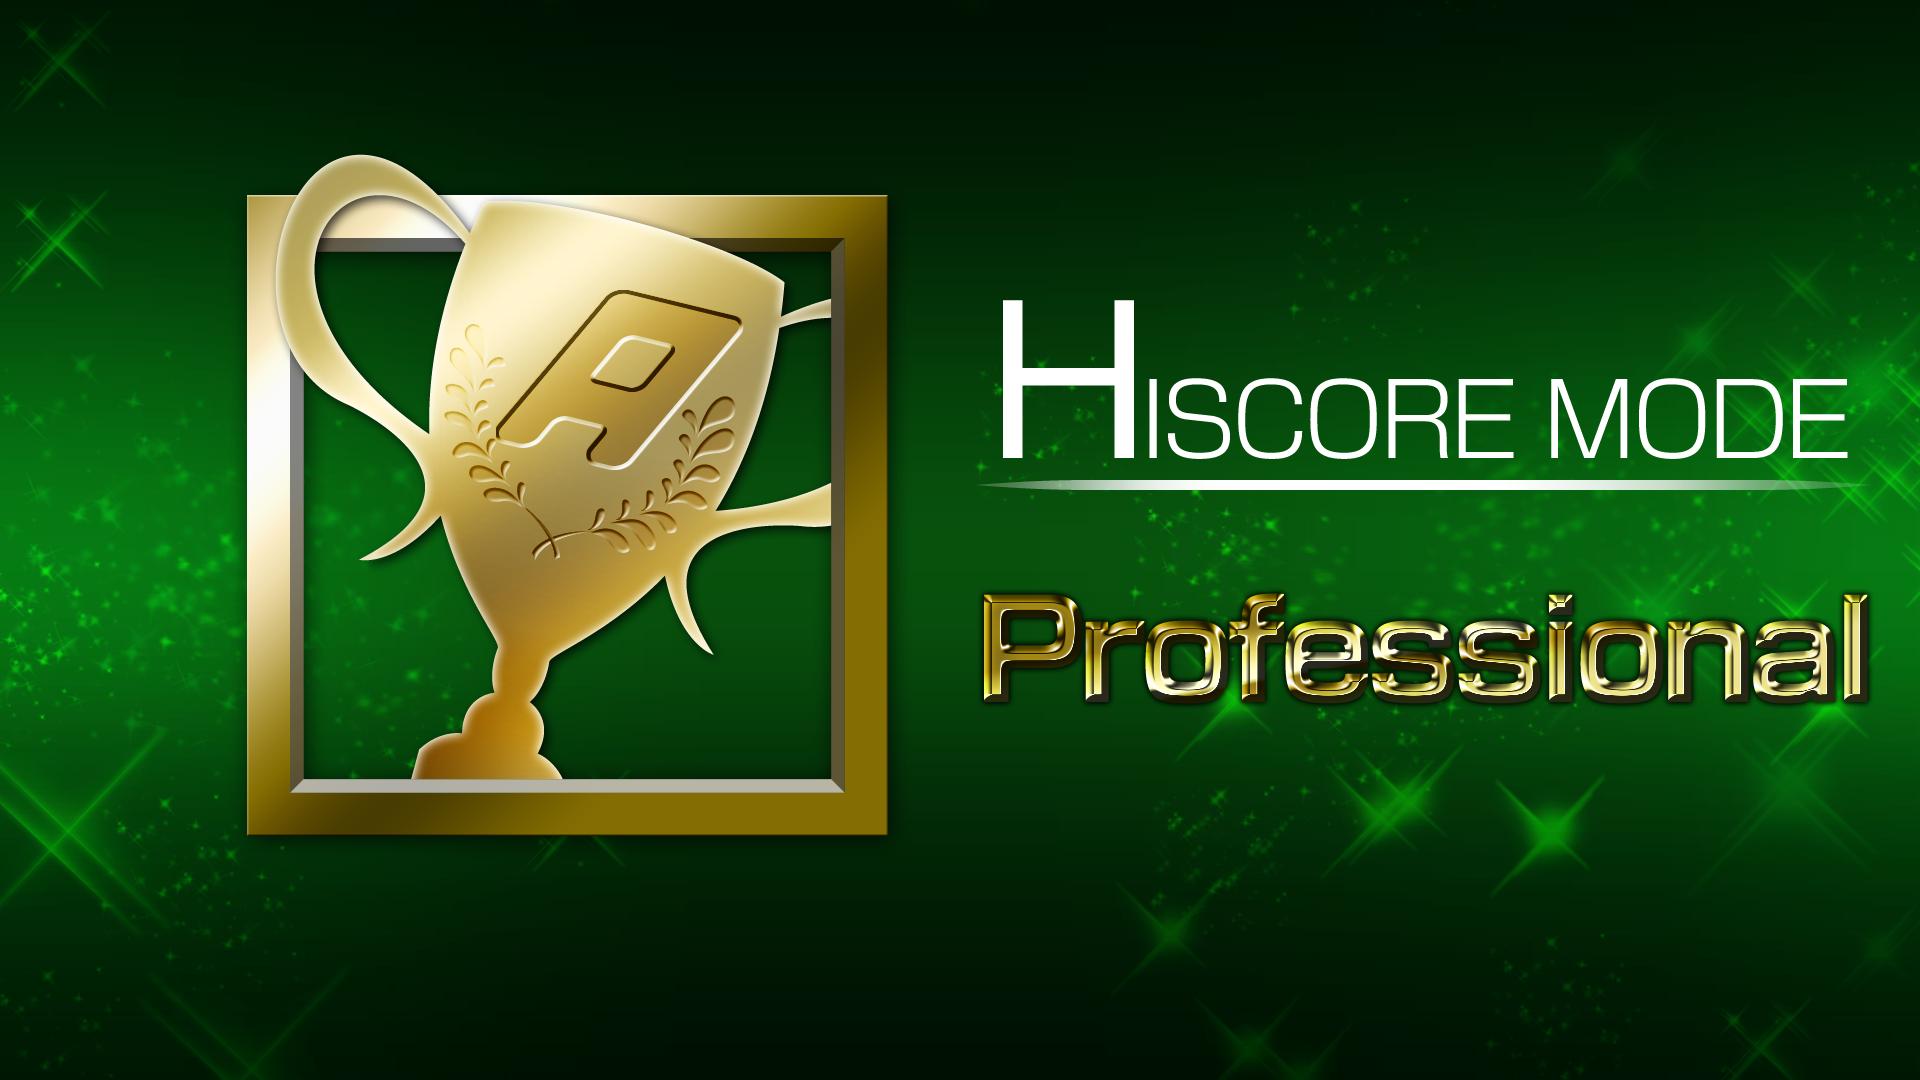 Icon for HI SCORE MODE 20,000,000 points